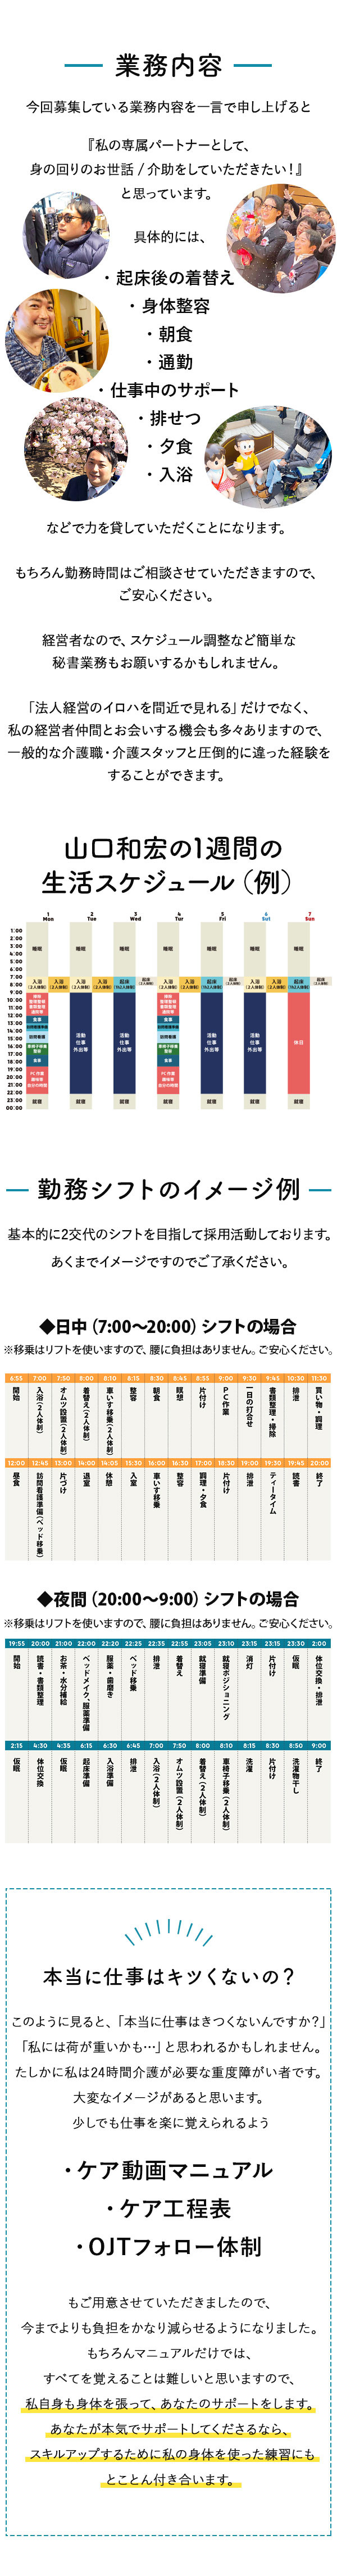 lp_sp_12.jpg